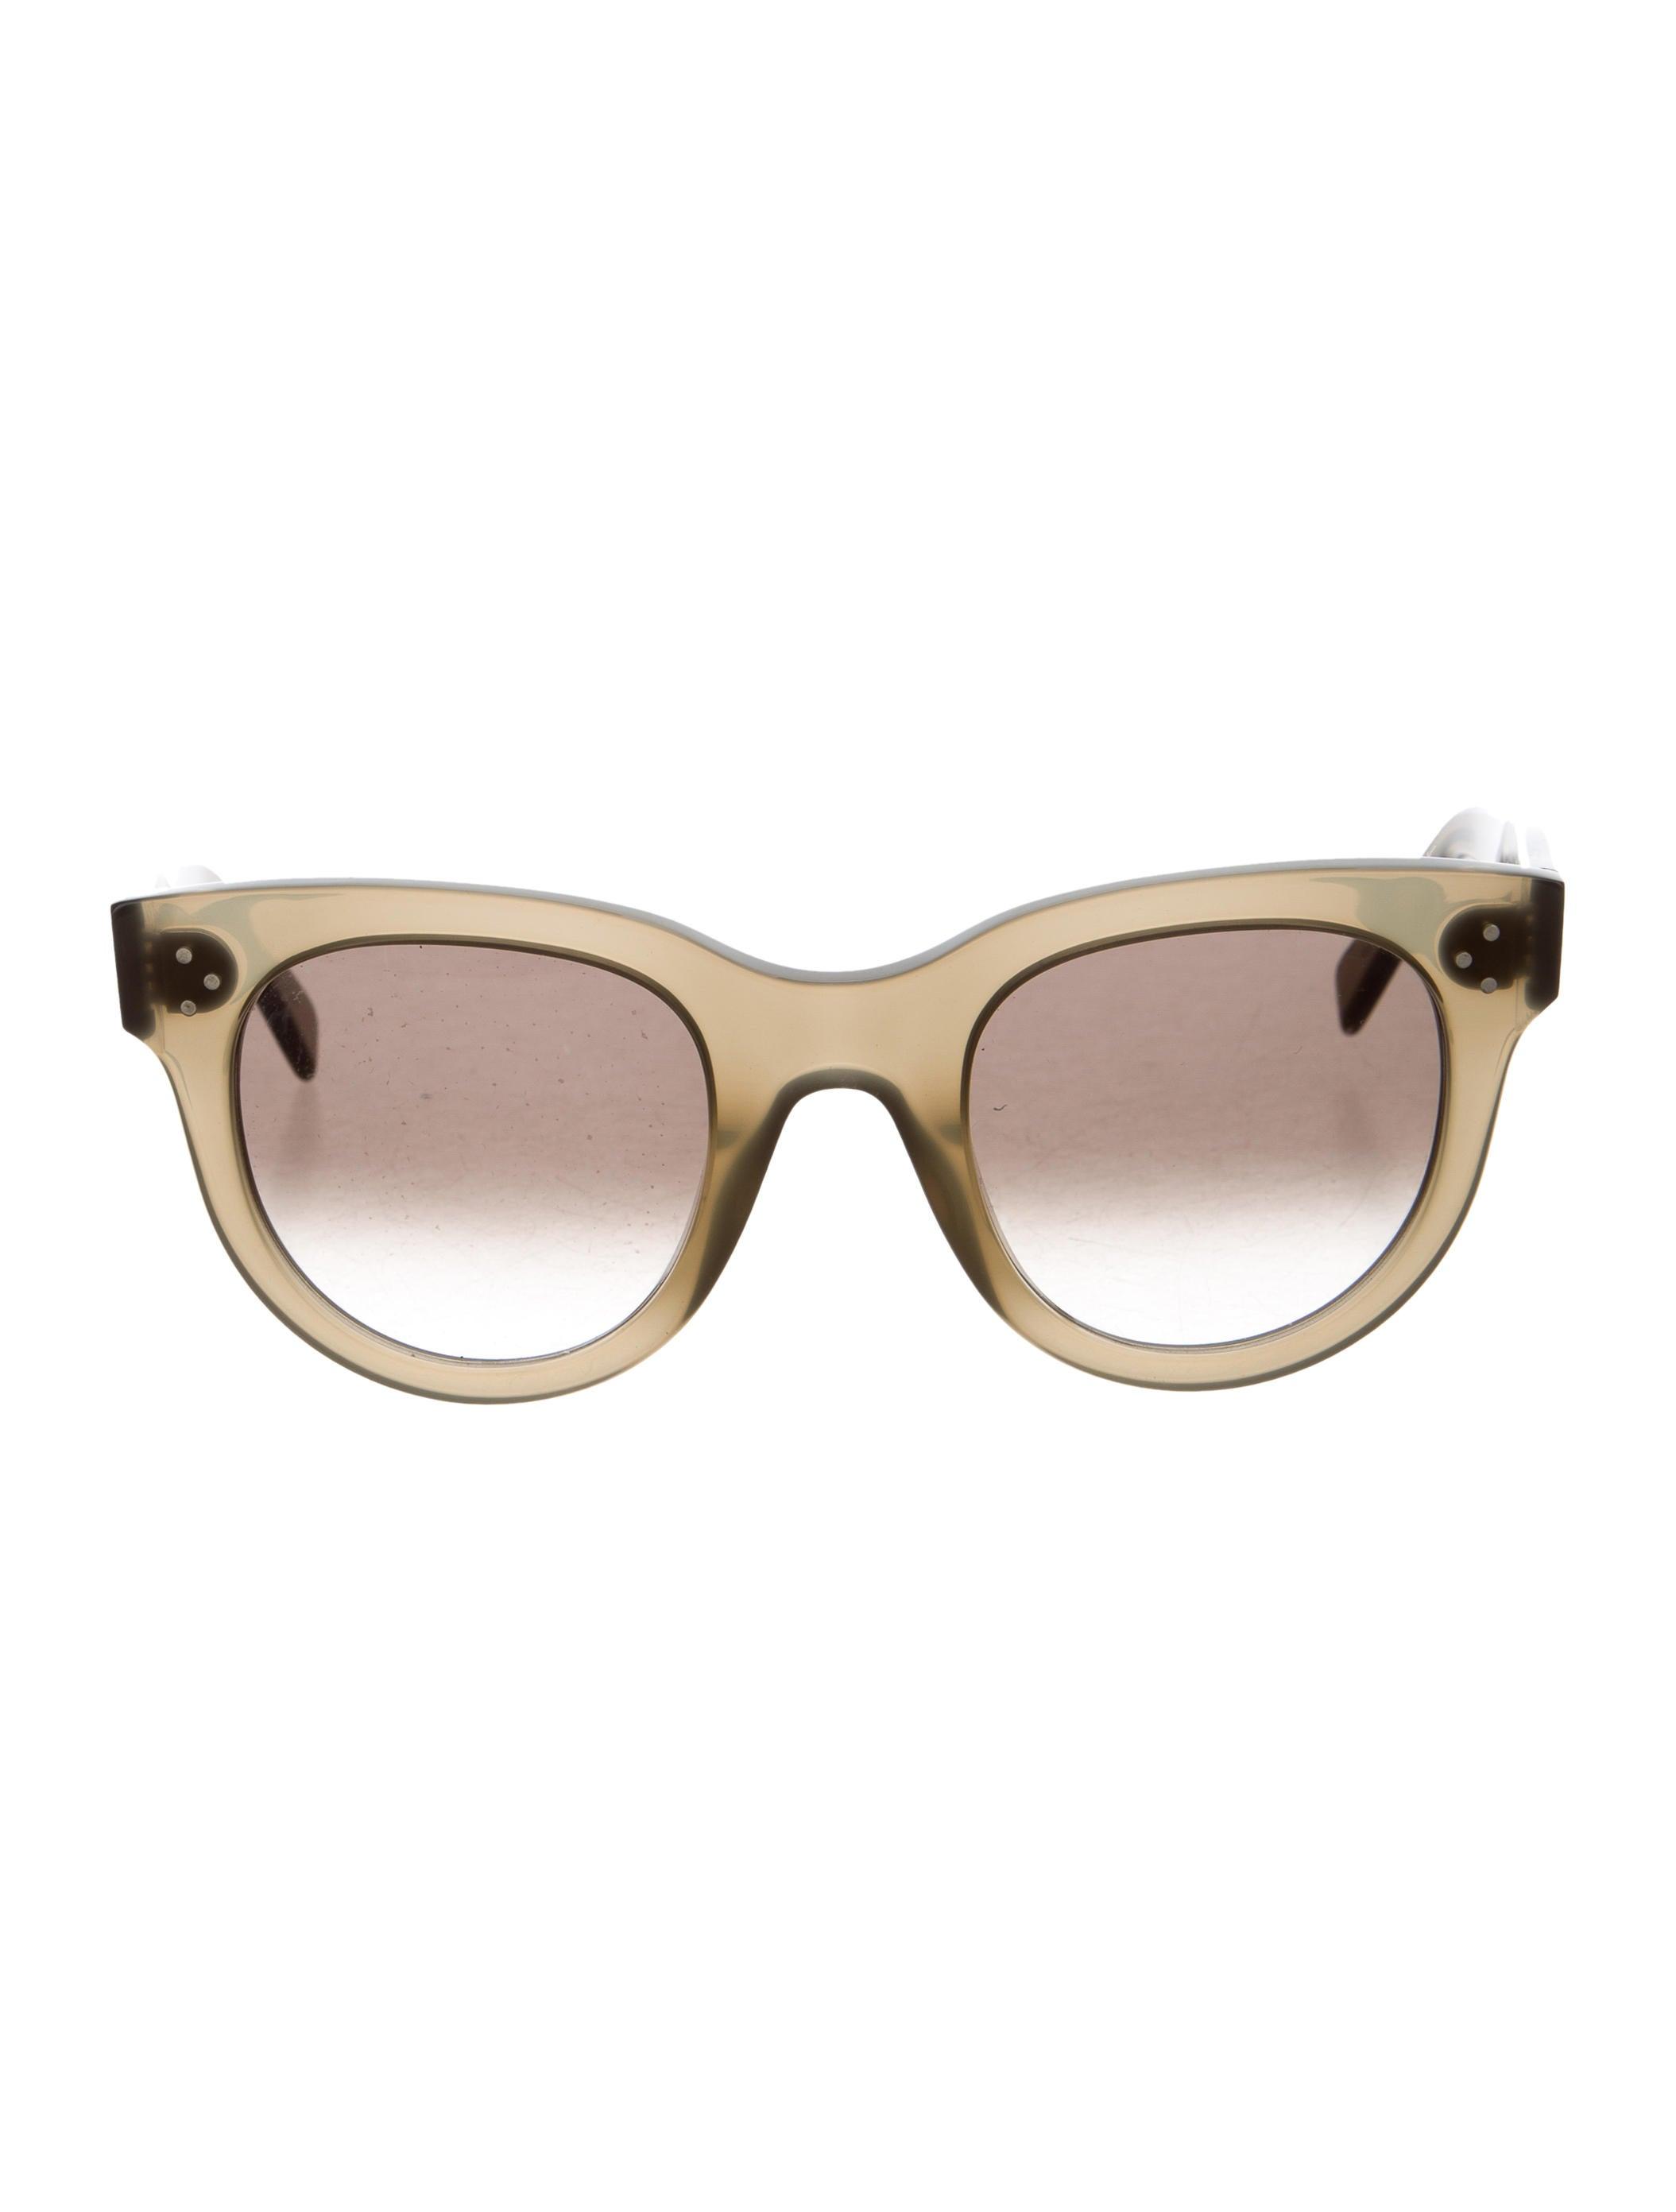 327adfa56b Céline Baby Audrey Sunglasses - Accessories - CEL58553